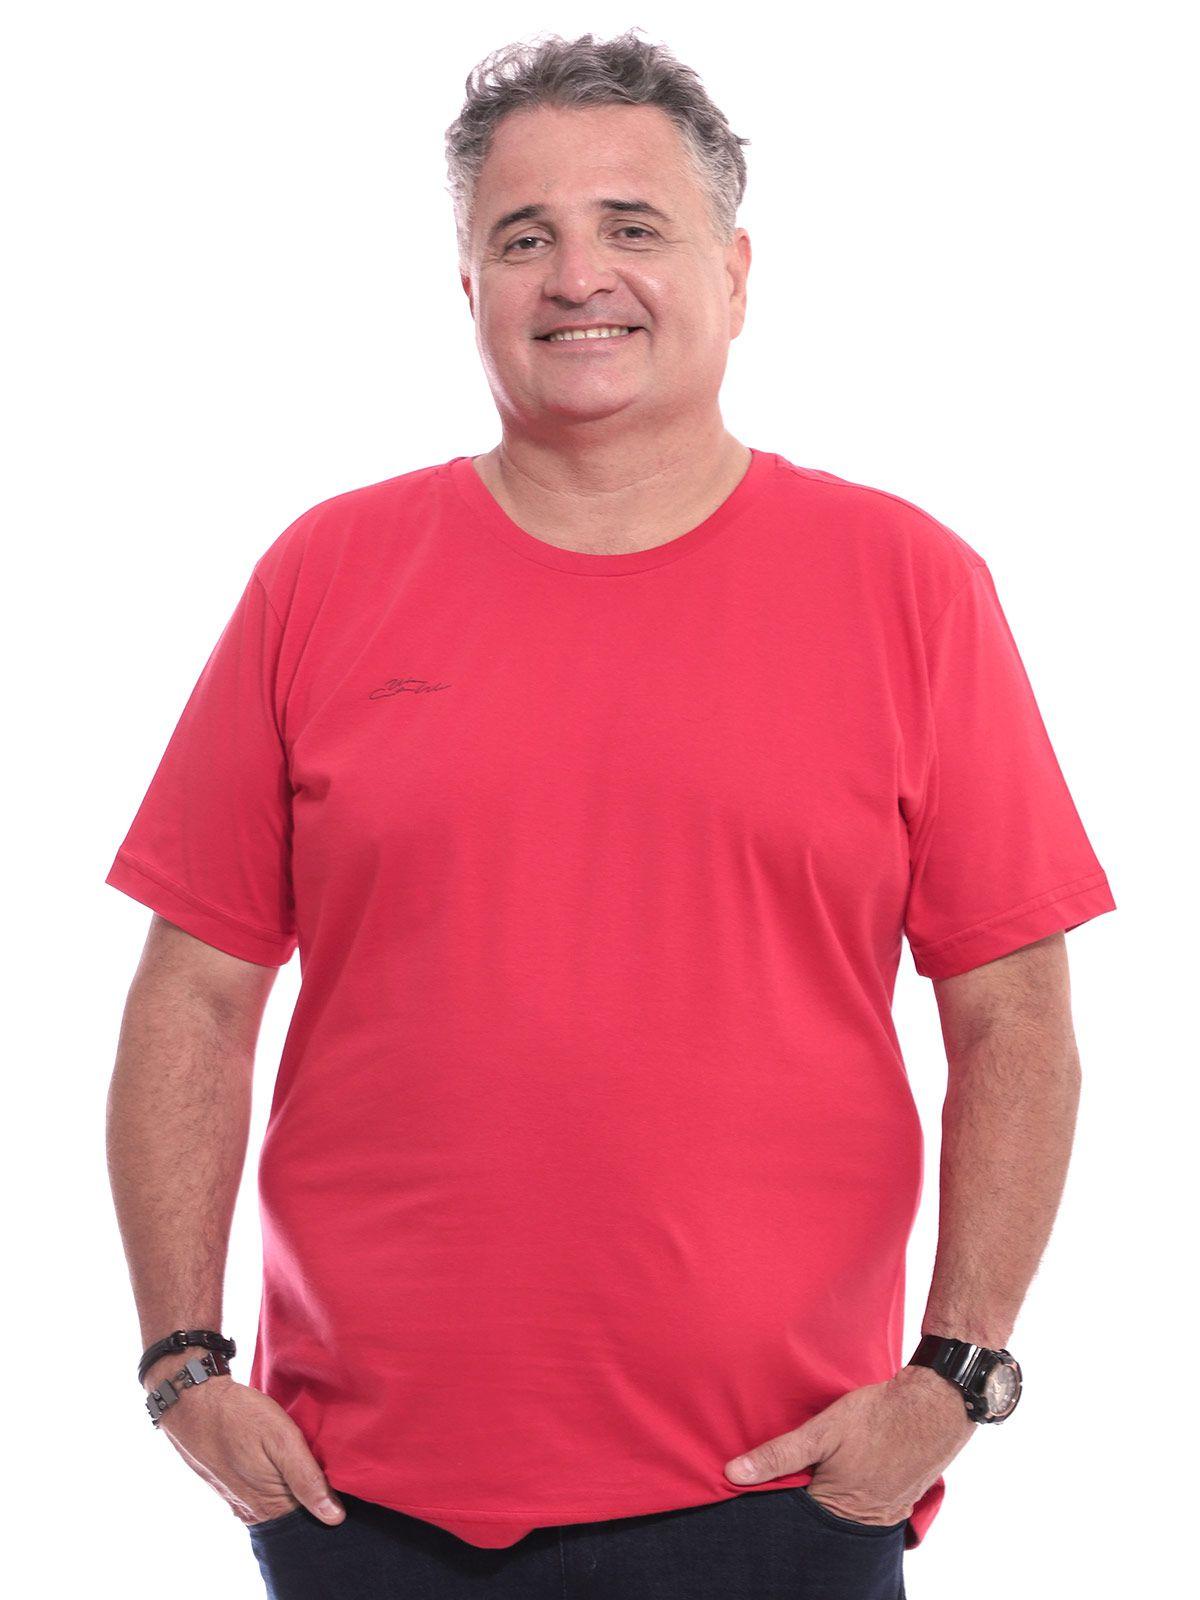 Camiseta Plus Size Anistia Estampa Lateral Vermelho